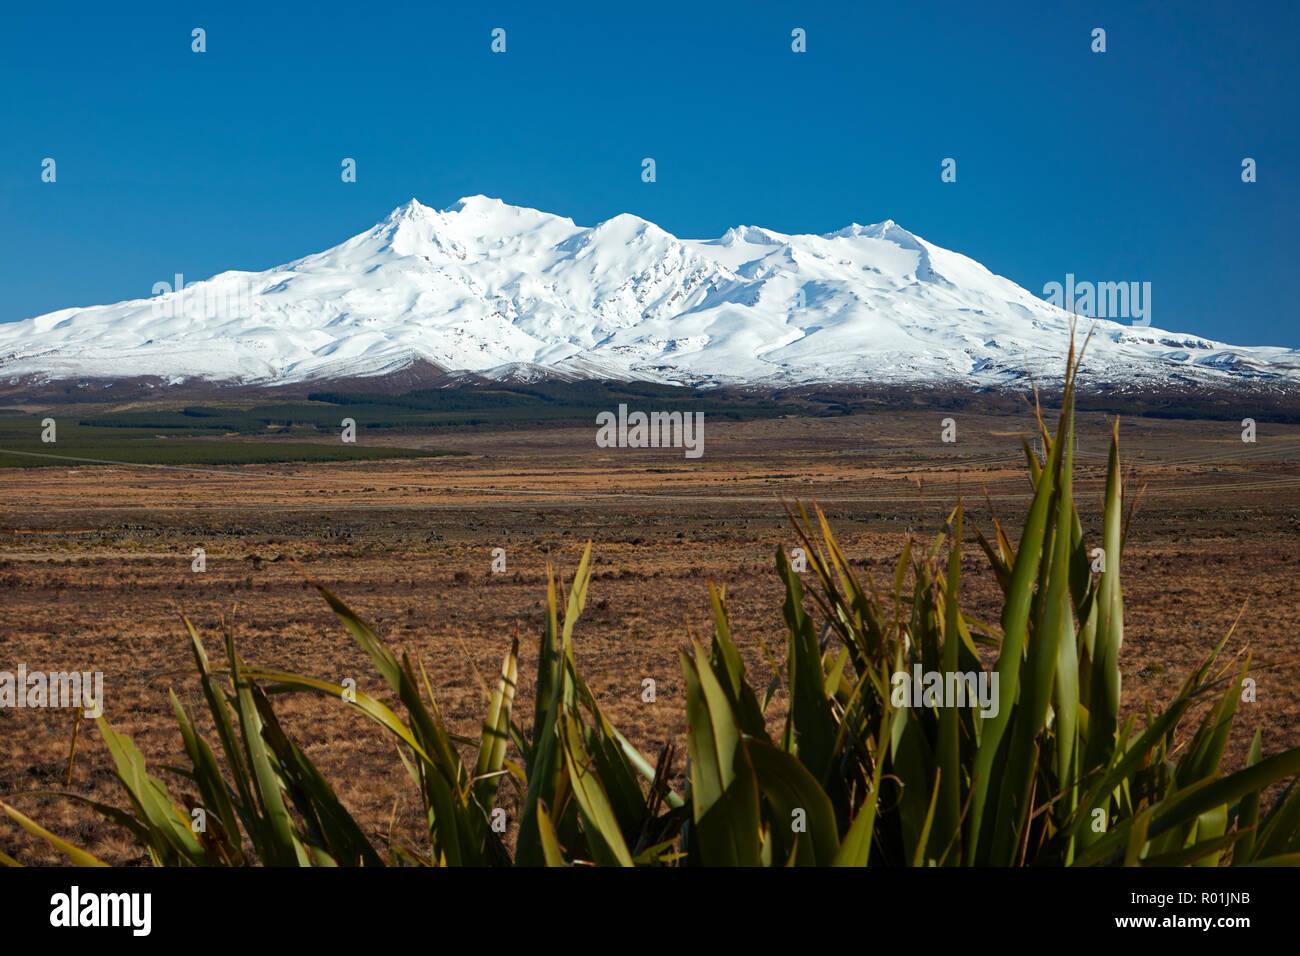 Mt Ruapehu, Rangipo Desert, and flax, Tongariro National Park, Central Plateau, North Island, New Zealand - Stock Image